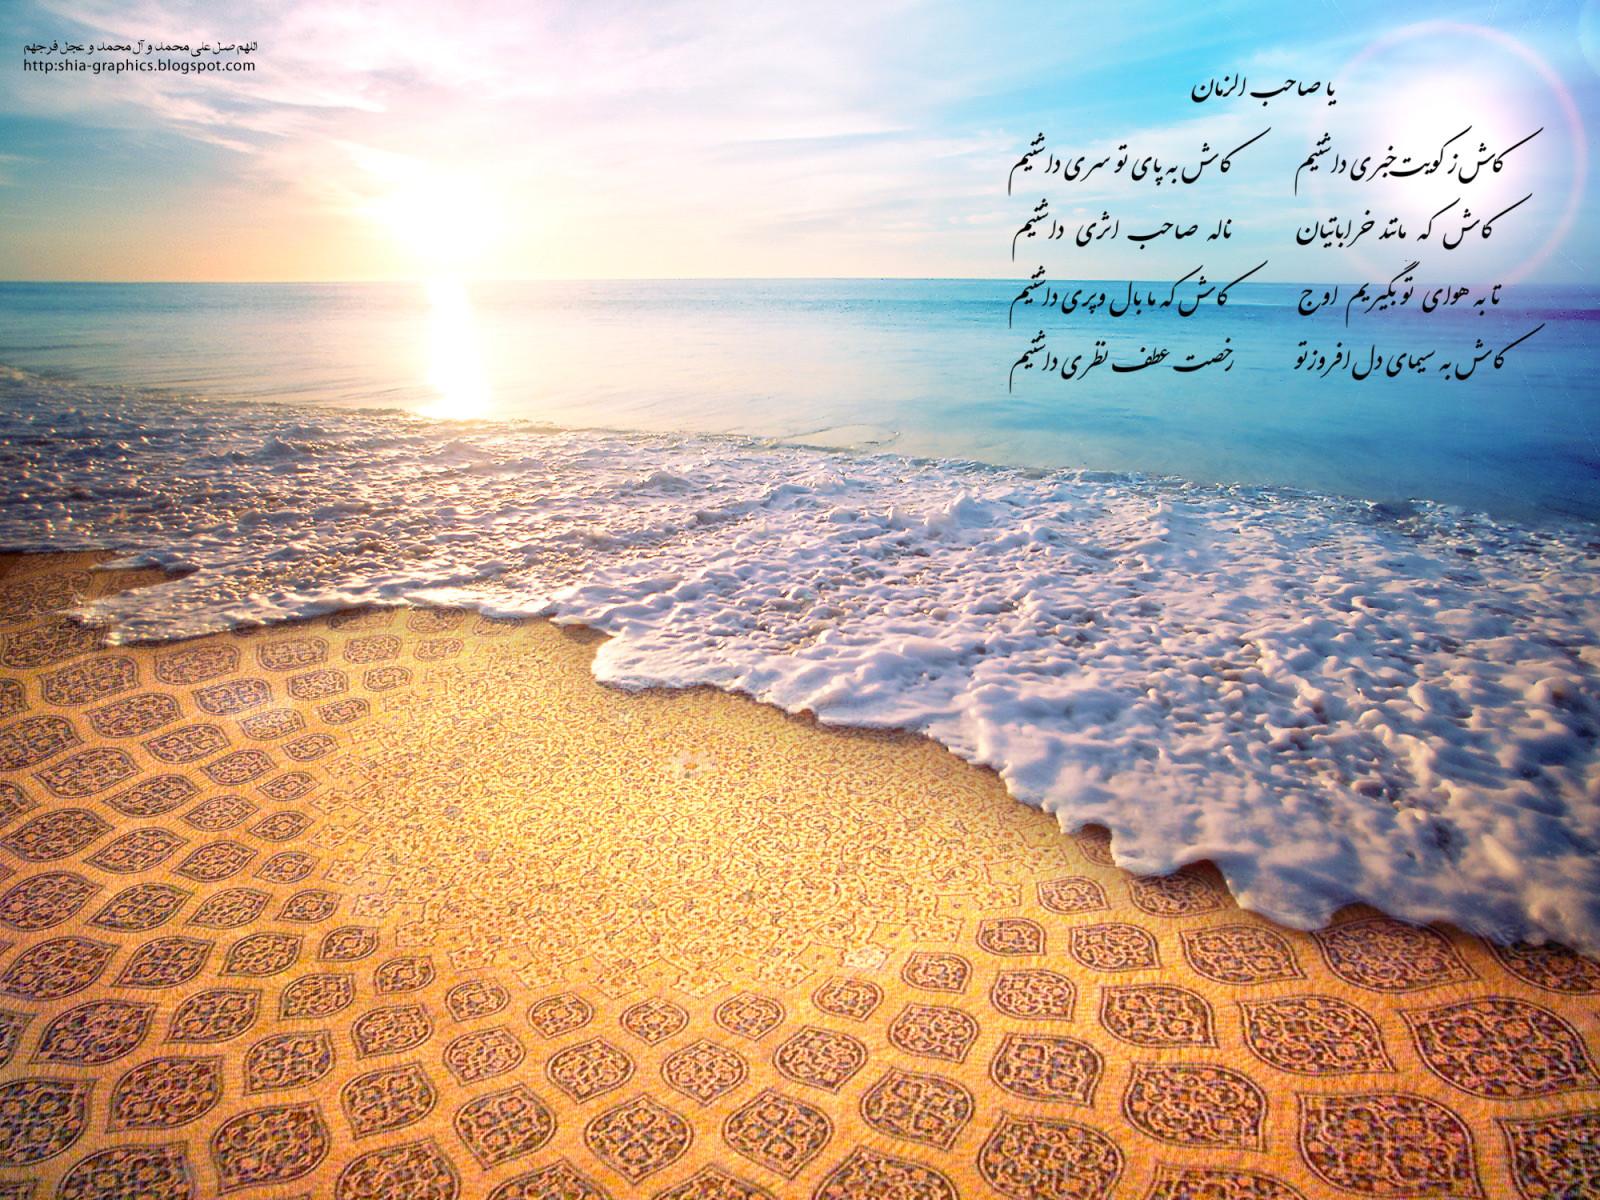 http://dl.aviny.com/Album/mazhabi/ahlbeit/mahdi/kamel/208.jpg